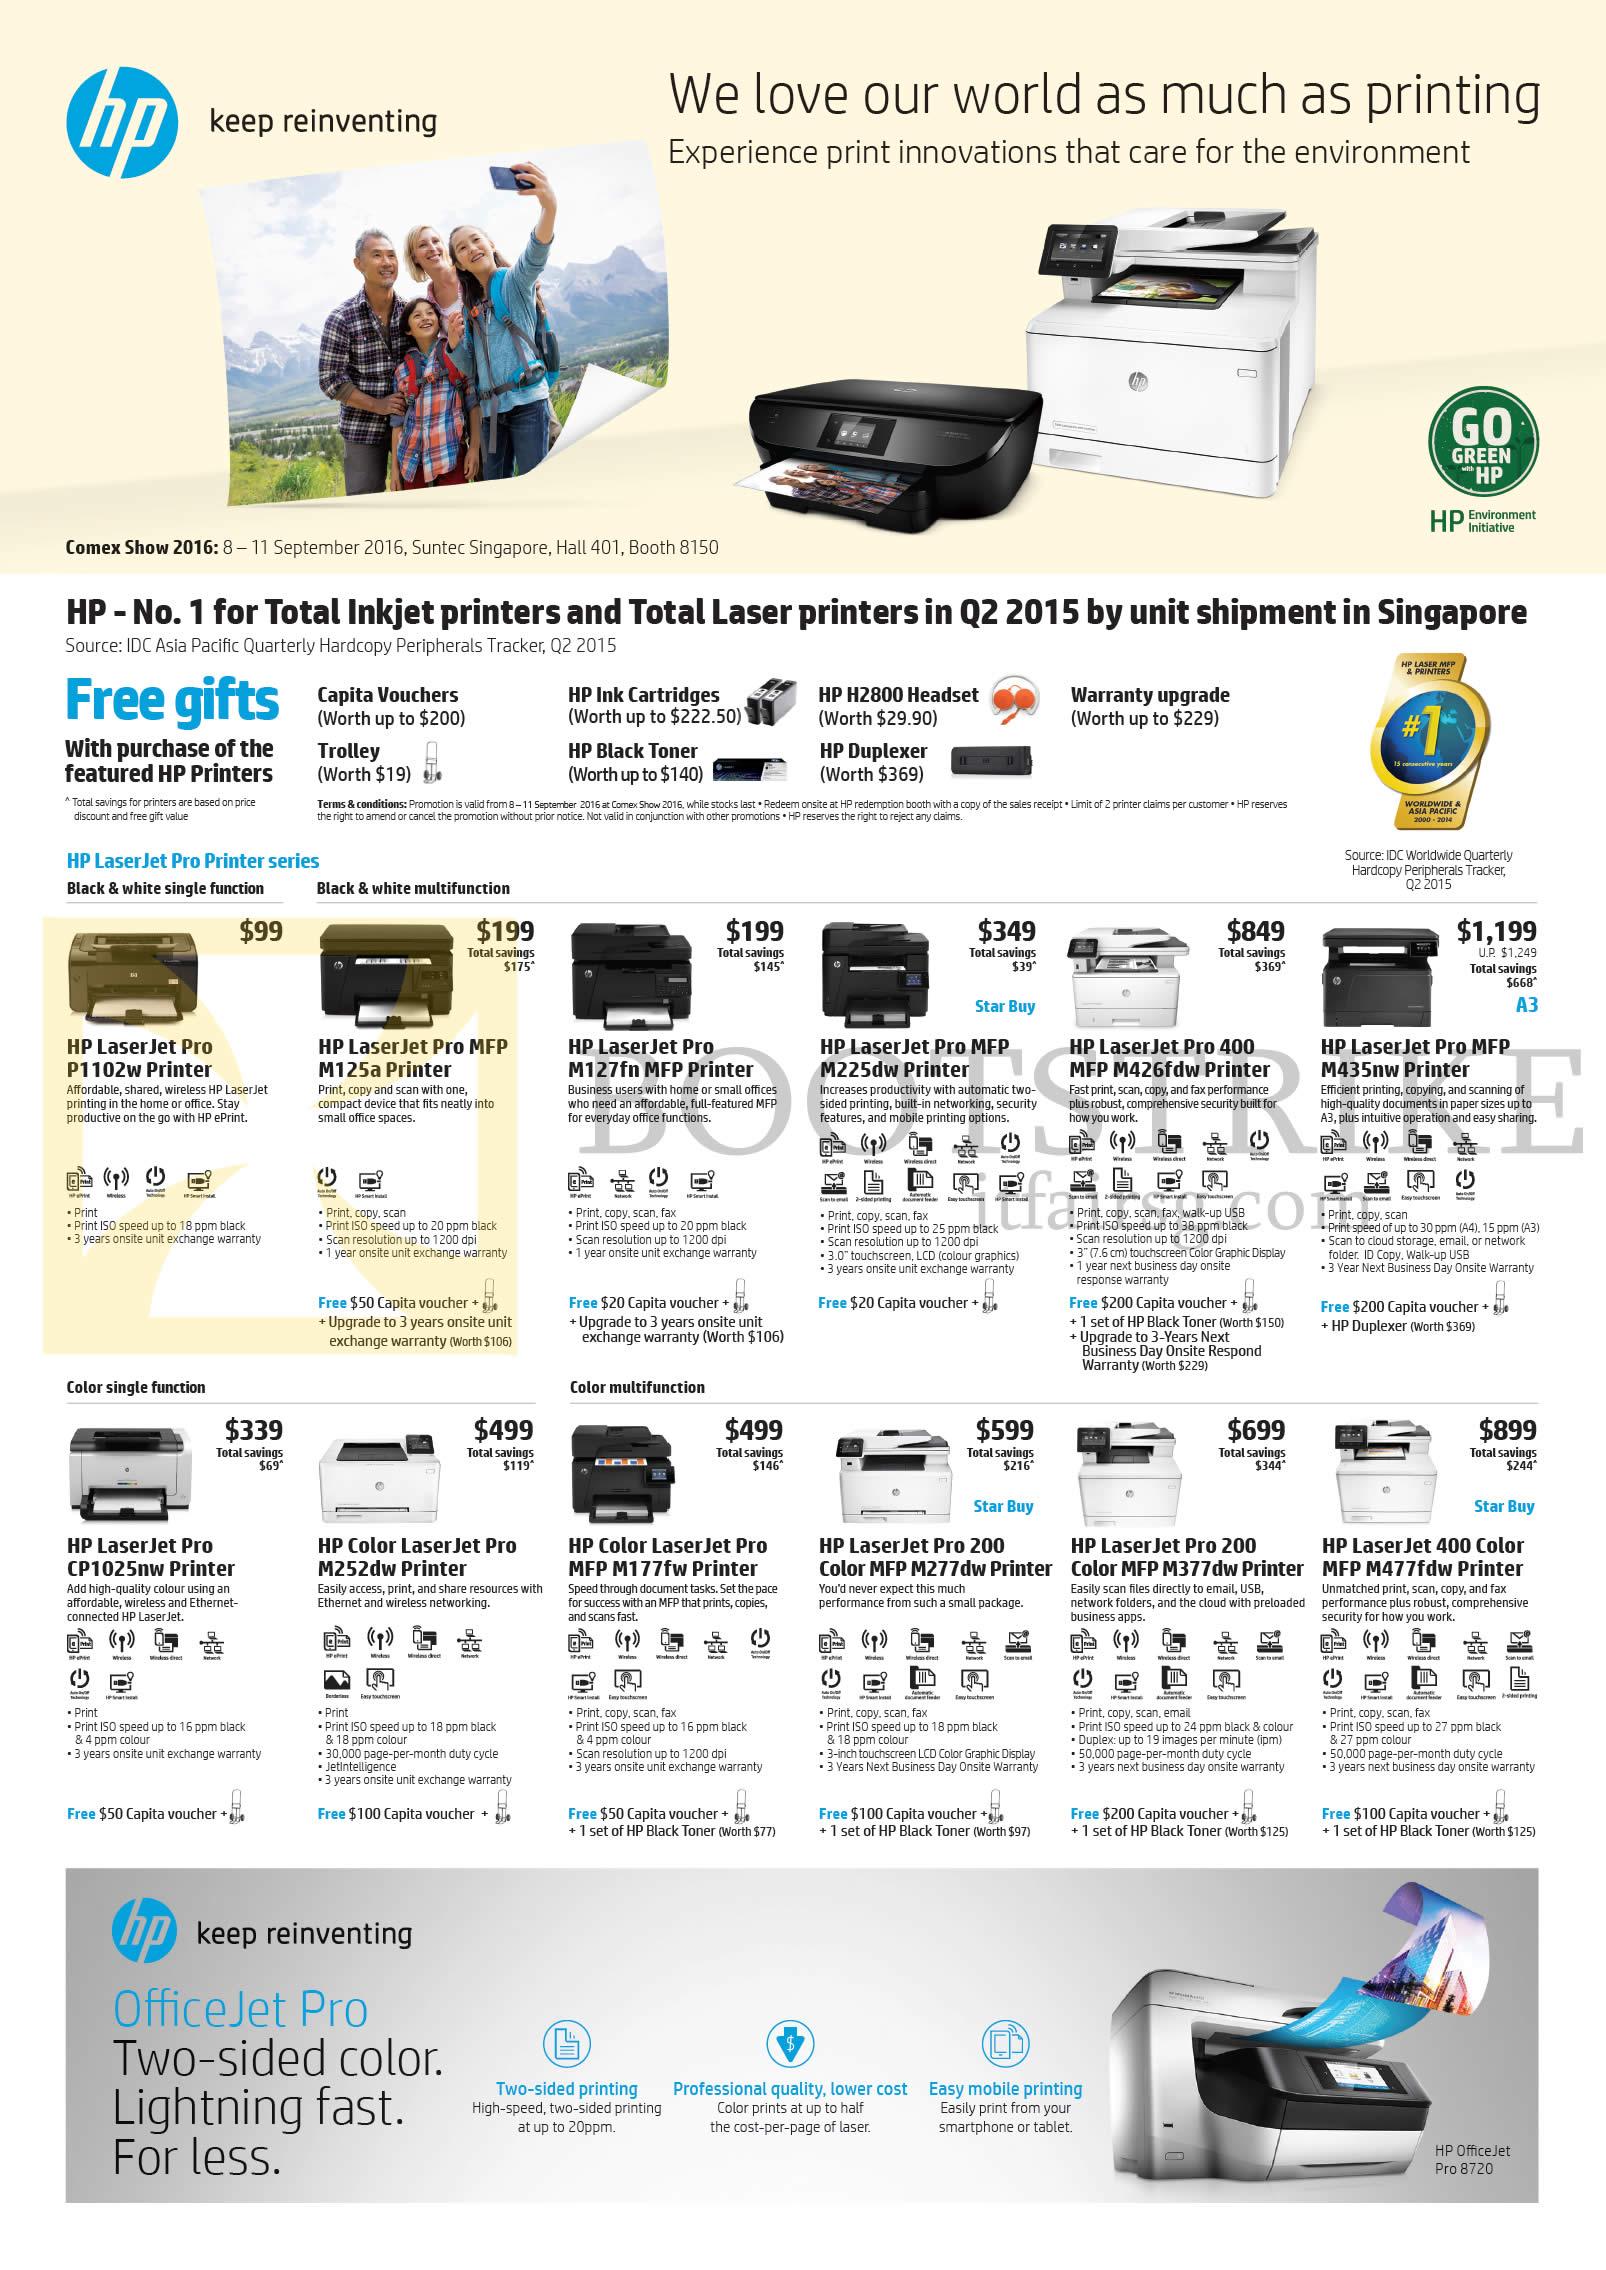 COMEX 2016 price list image brochure of HP Printers LaserJet Pro Black, White Single Function, Multi Function, Color Single Function, Color Multifunction